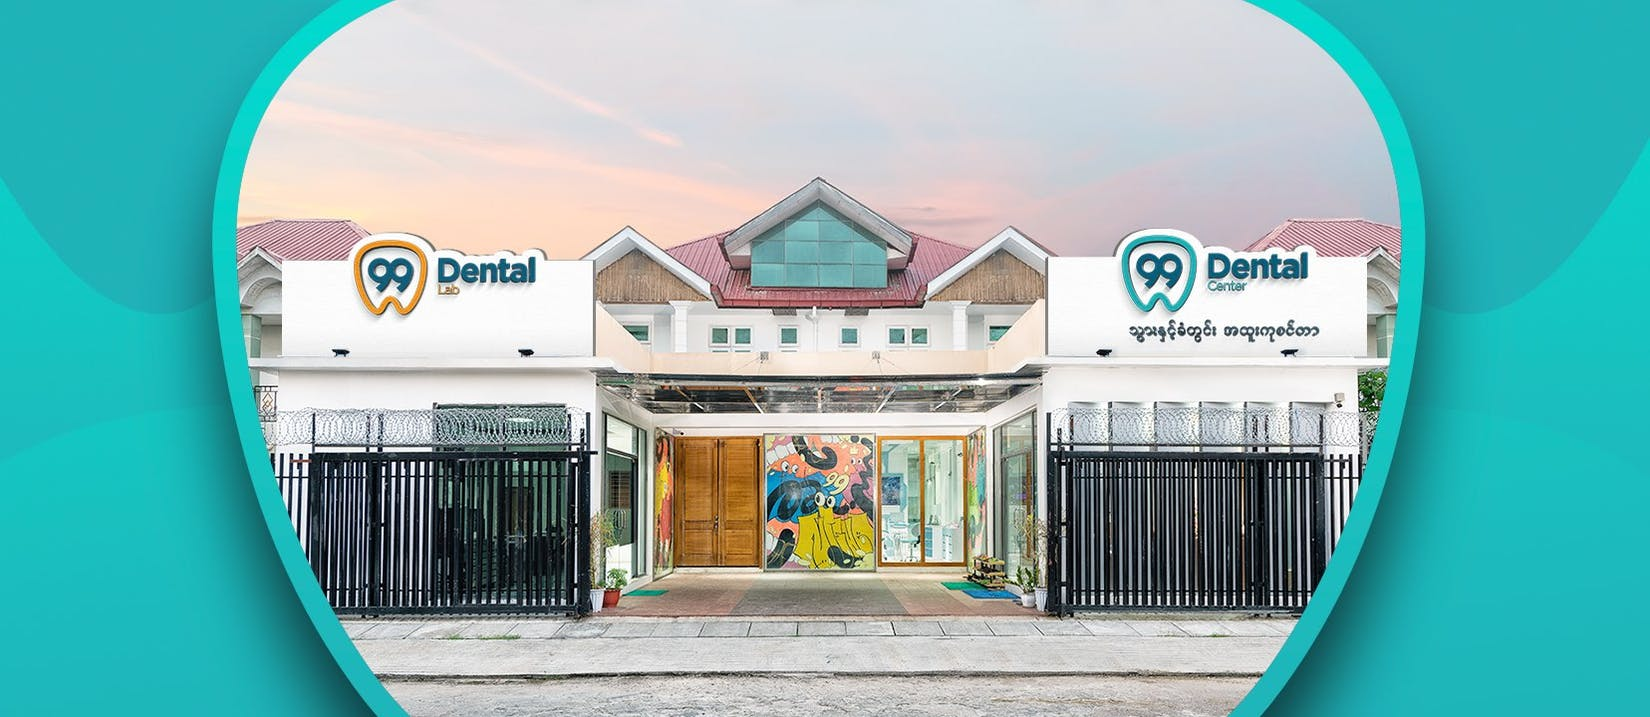 99 Dental clinic   Medical